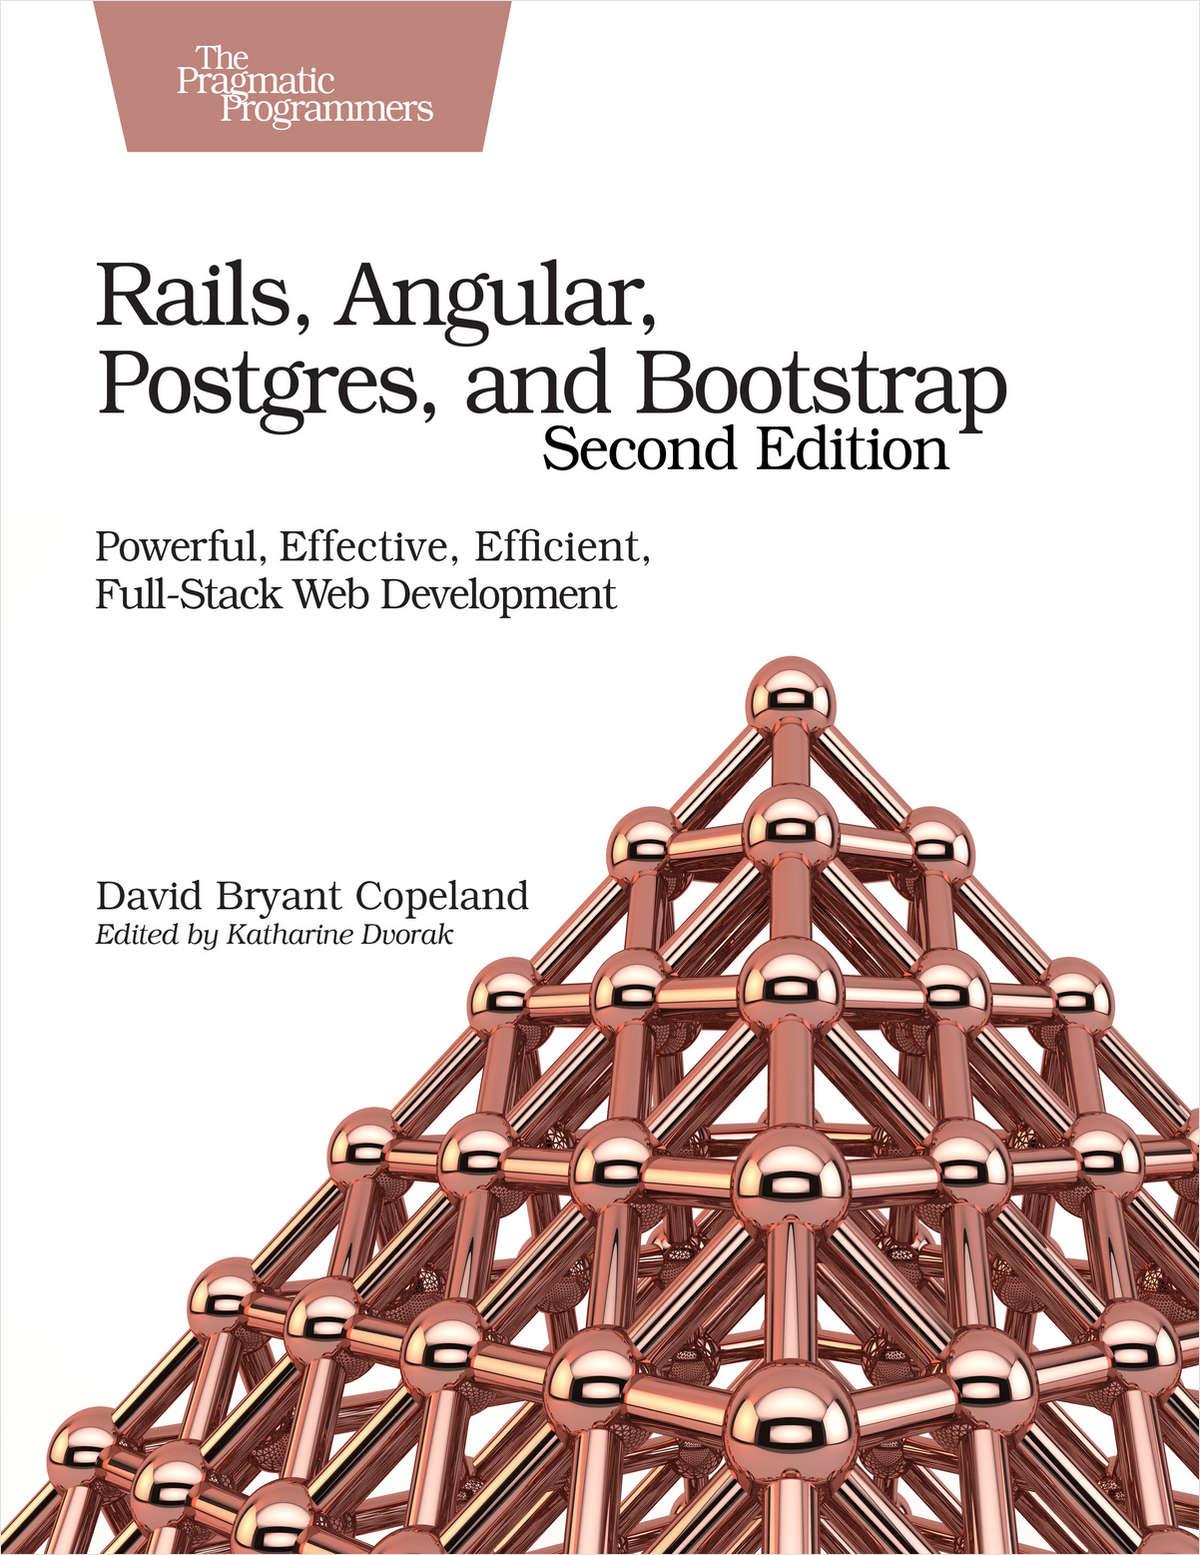 Rails, Angular, Postgres, and Bootstrap, Second Edition